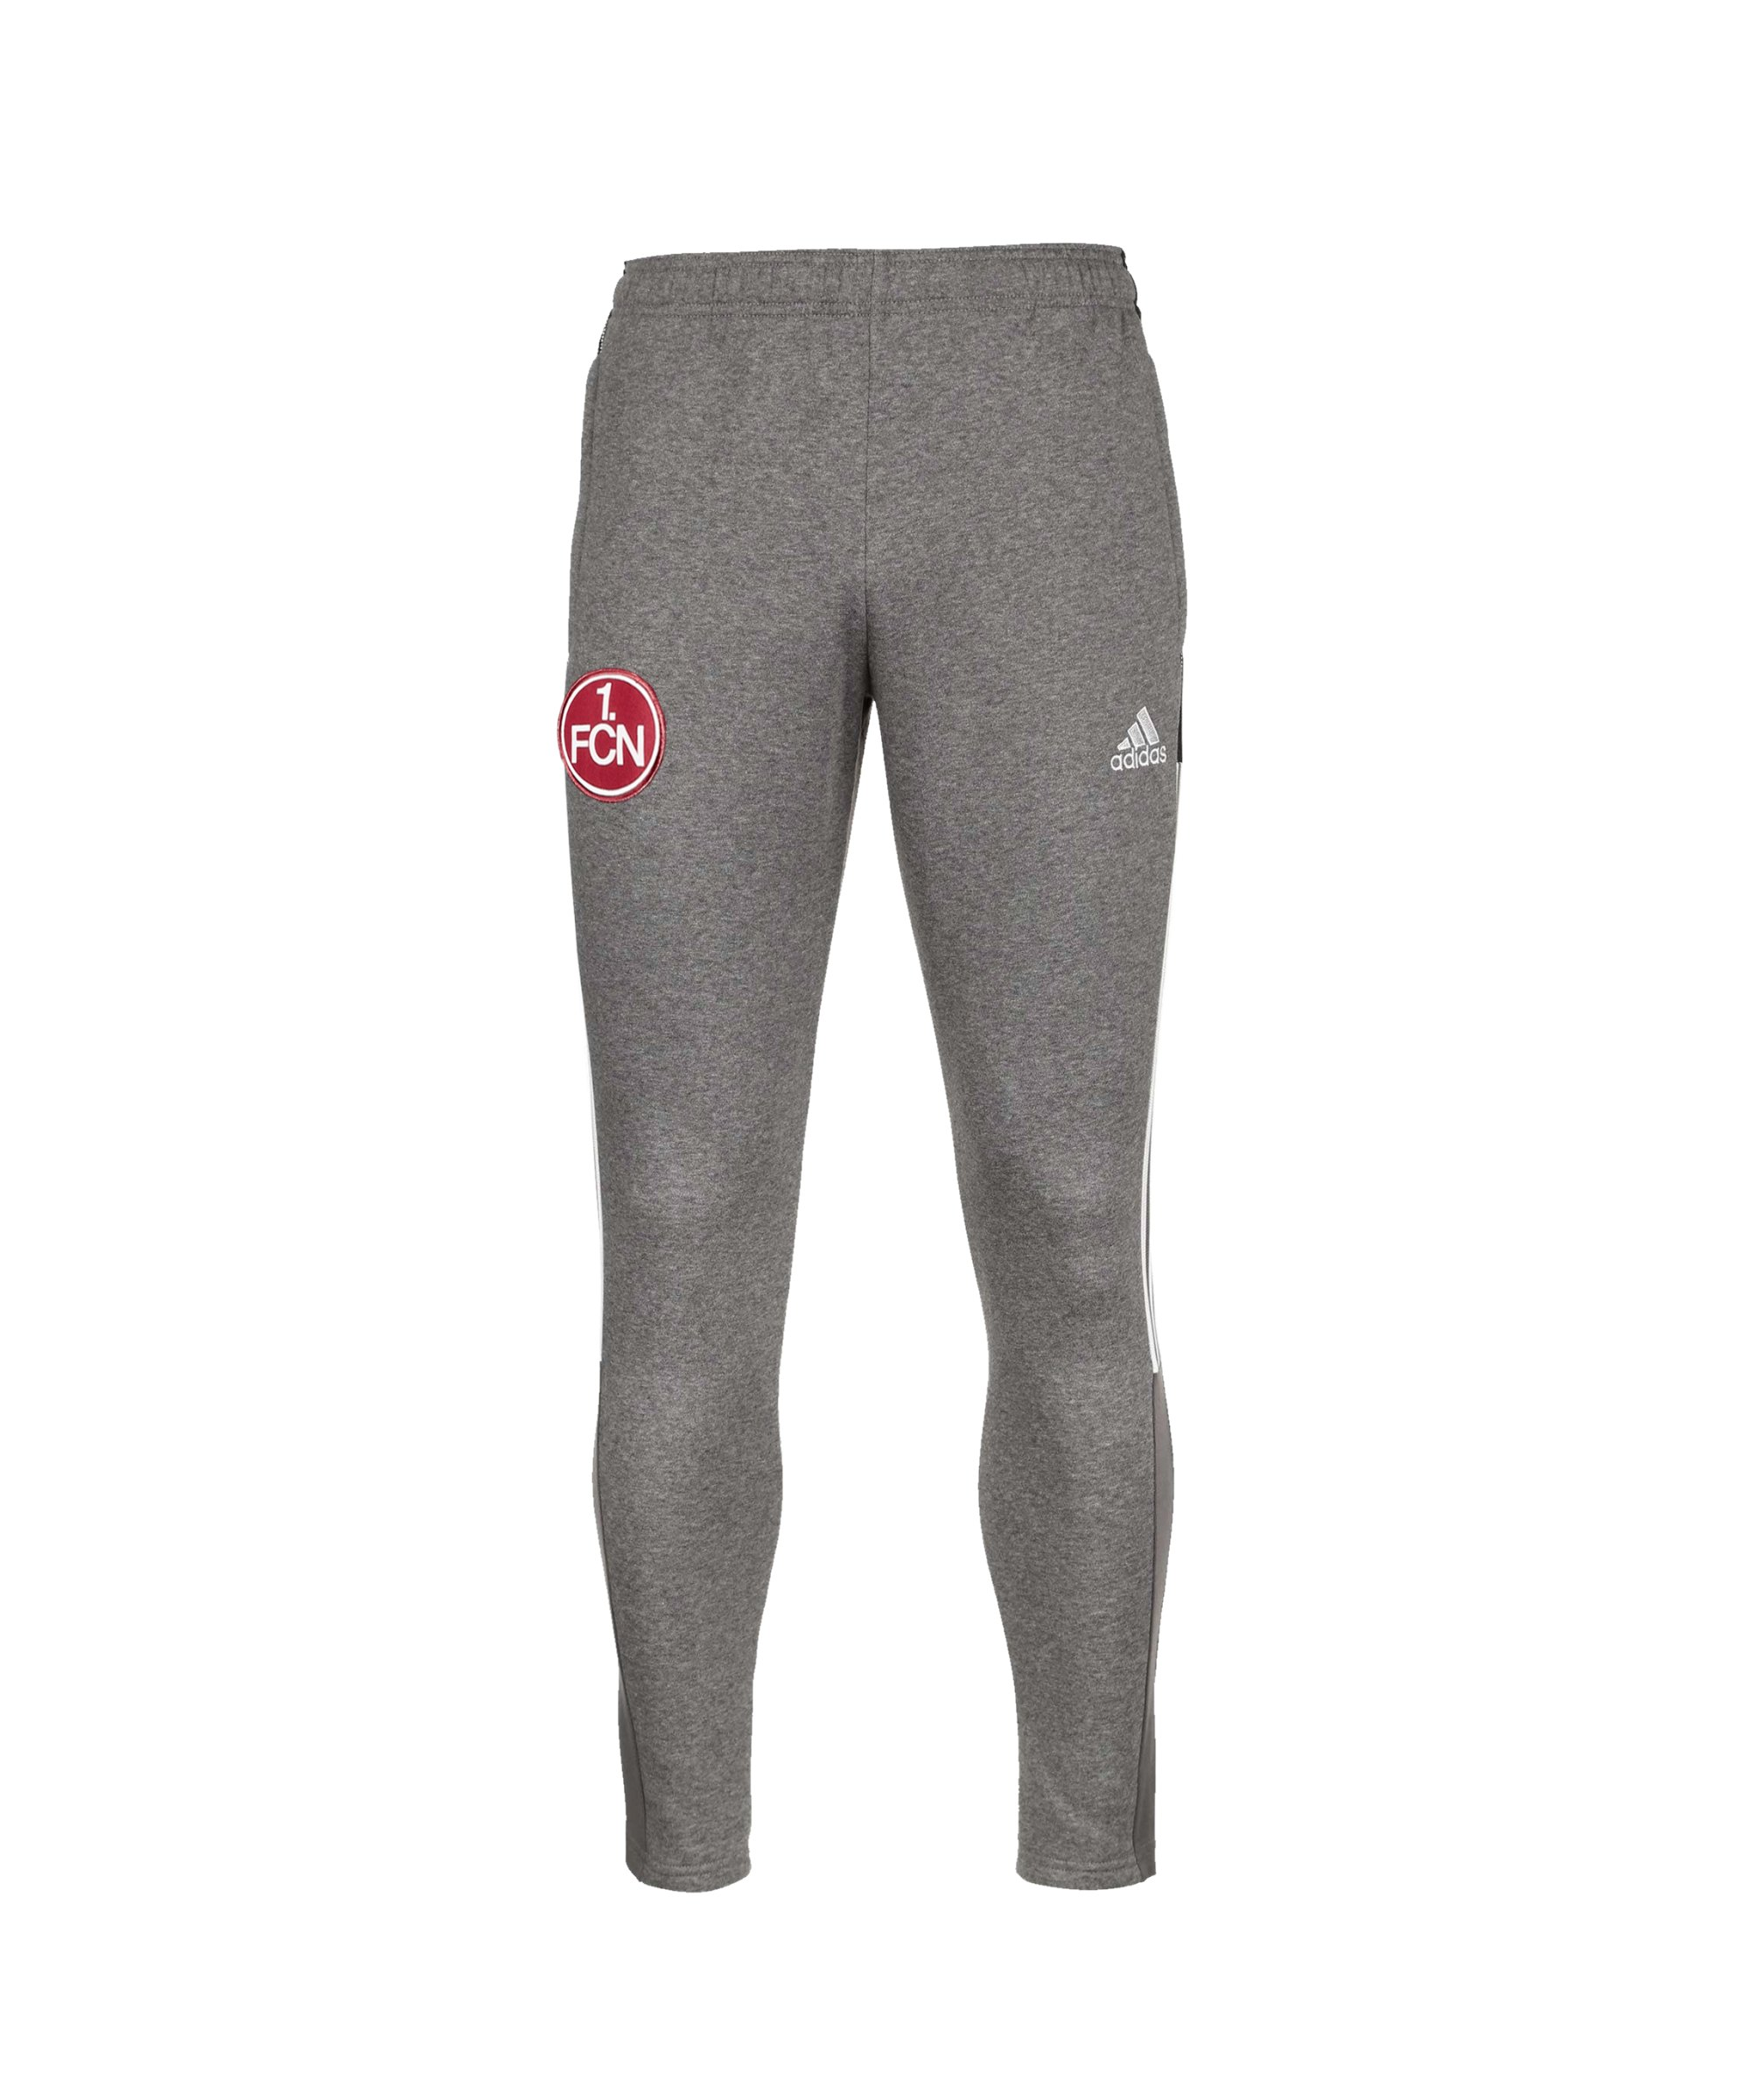 adidas 1. FC Nürnberg Jogginghose Grau - grau